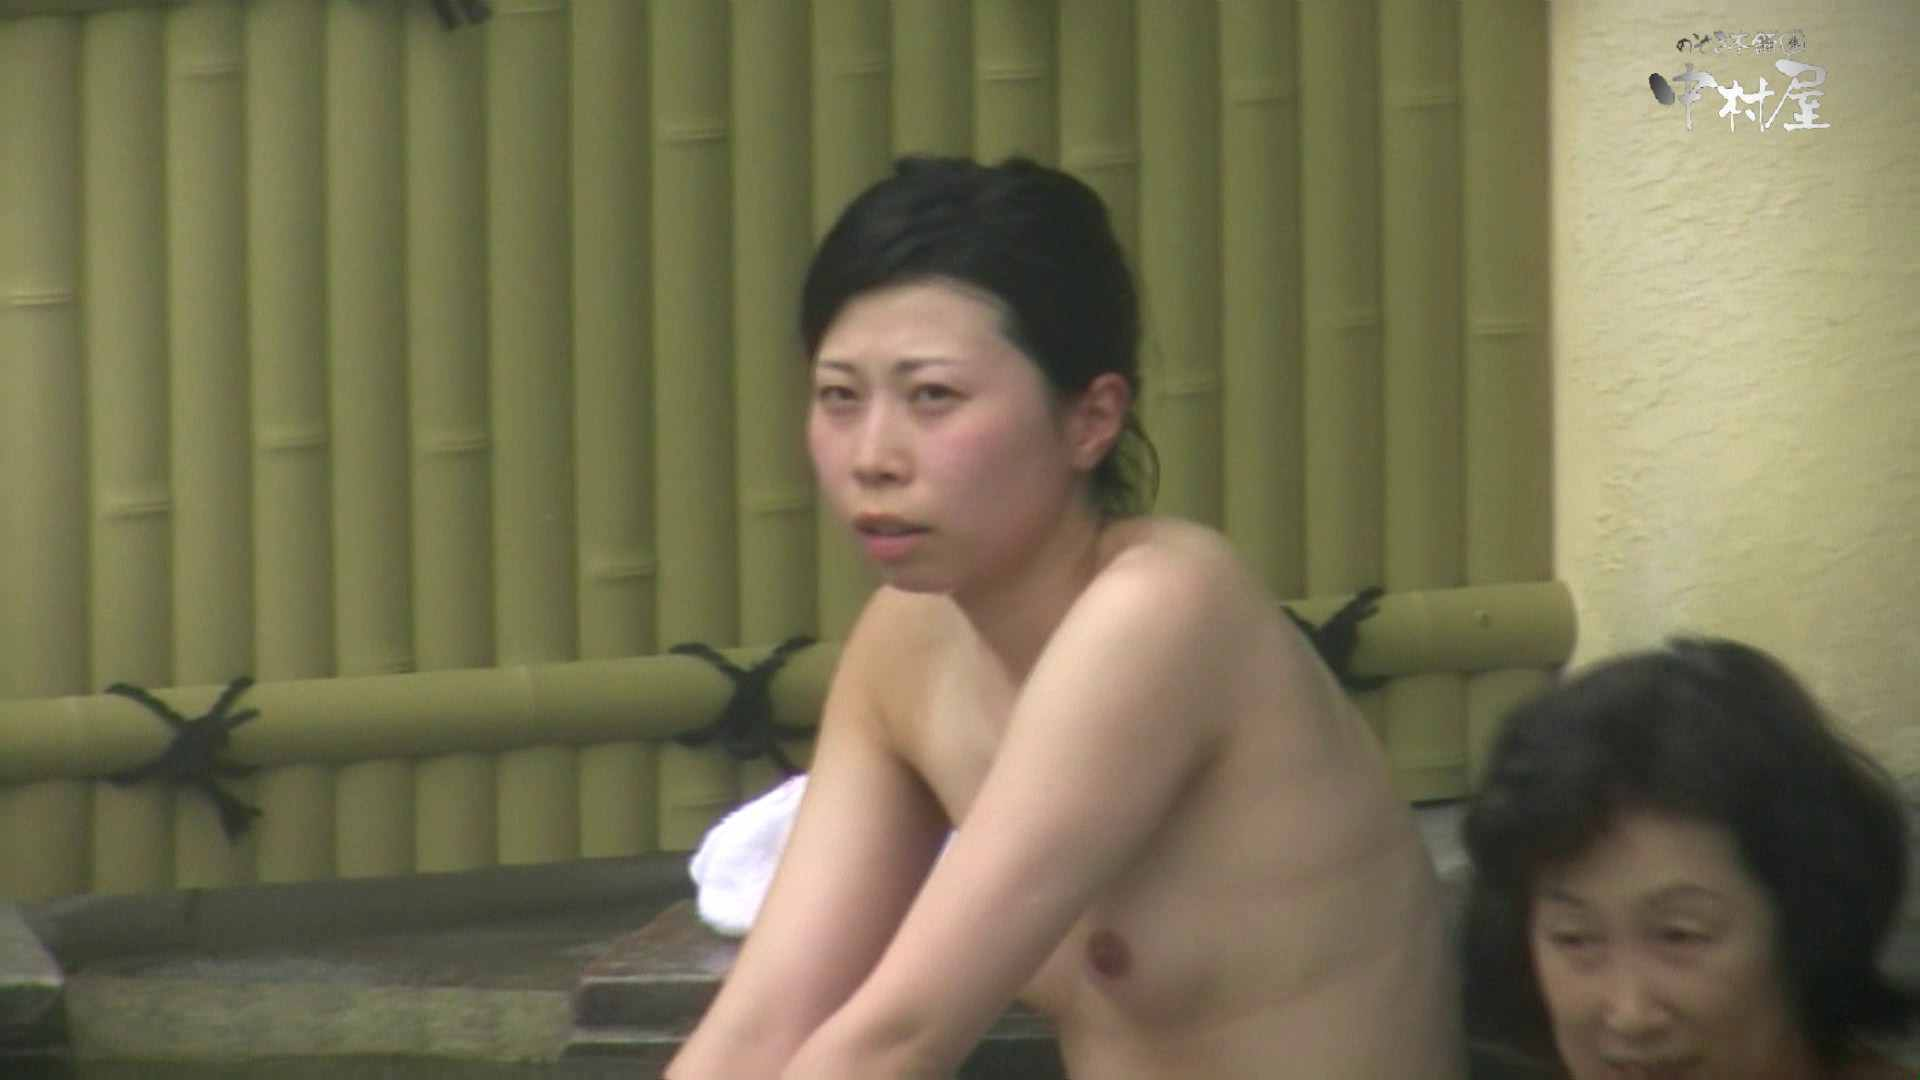 Aquaな露天風呂Vol.891 0  69連発 34